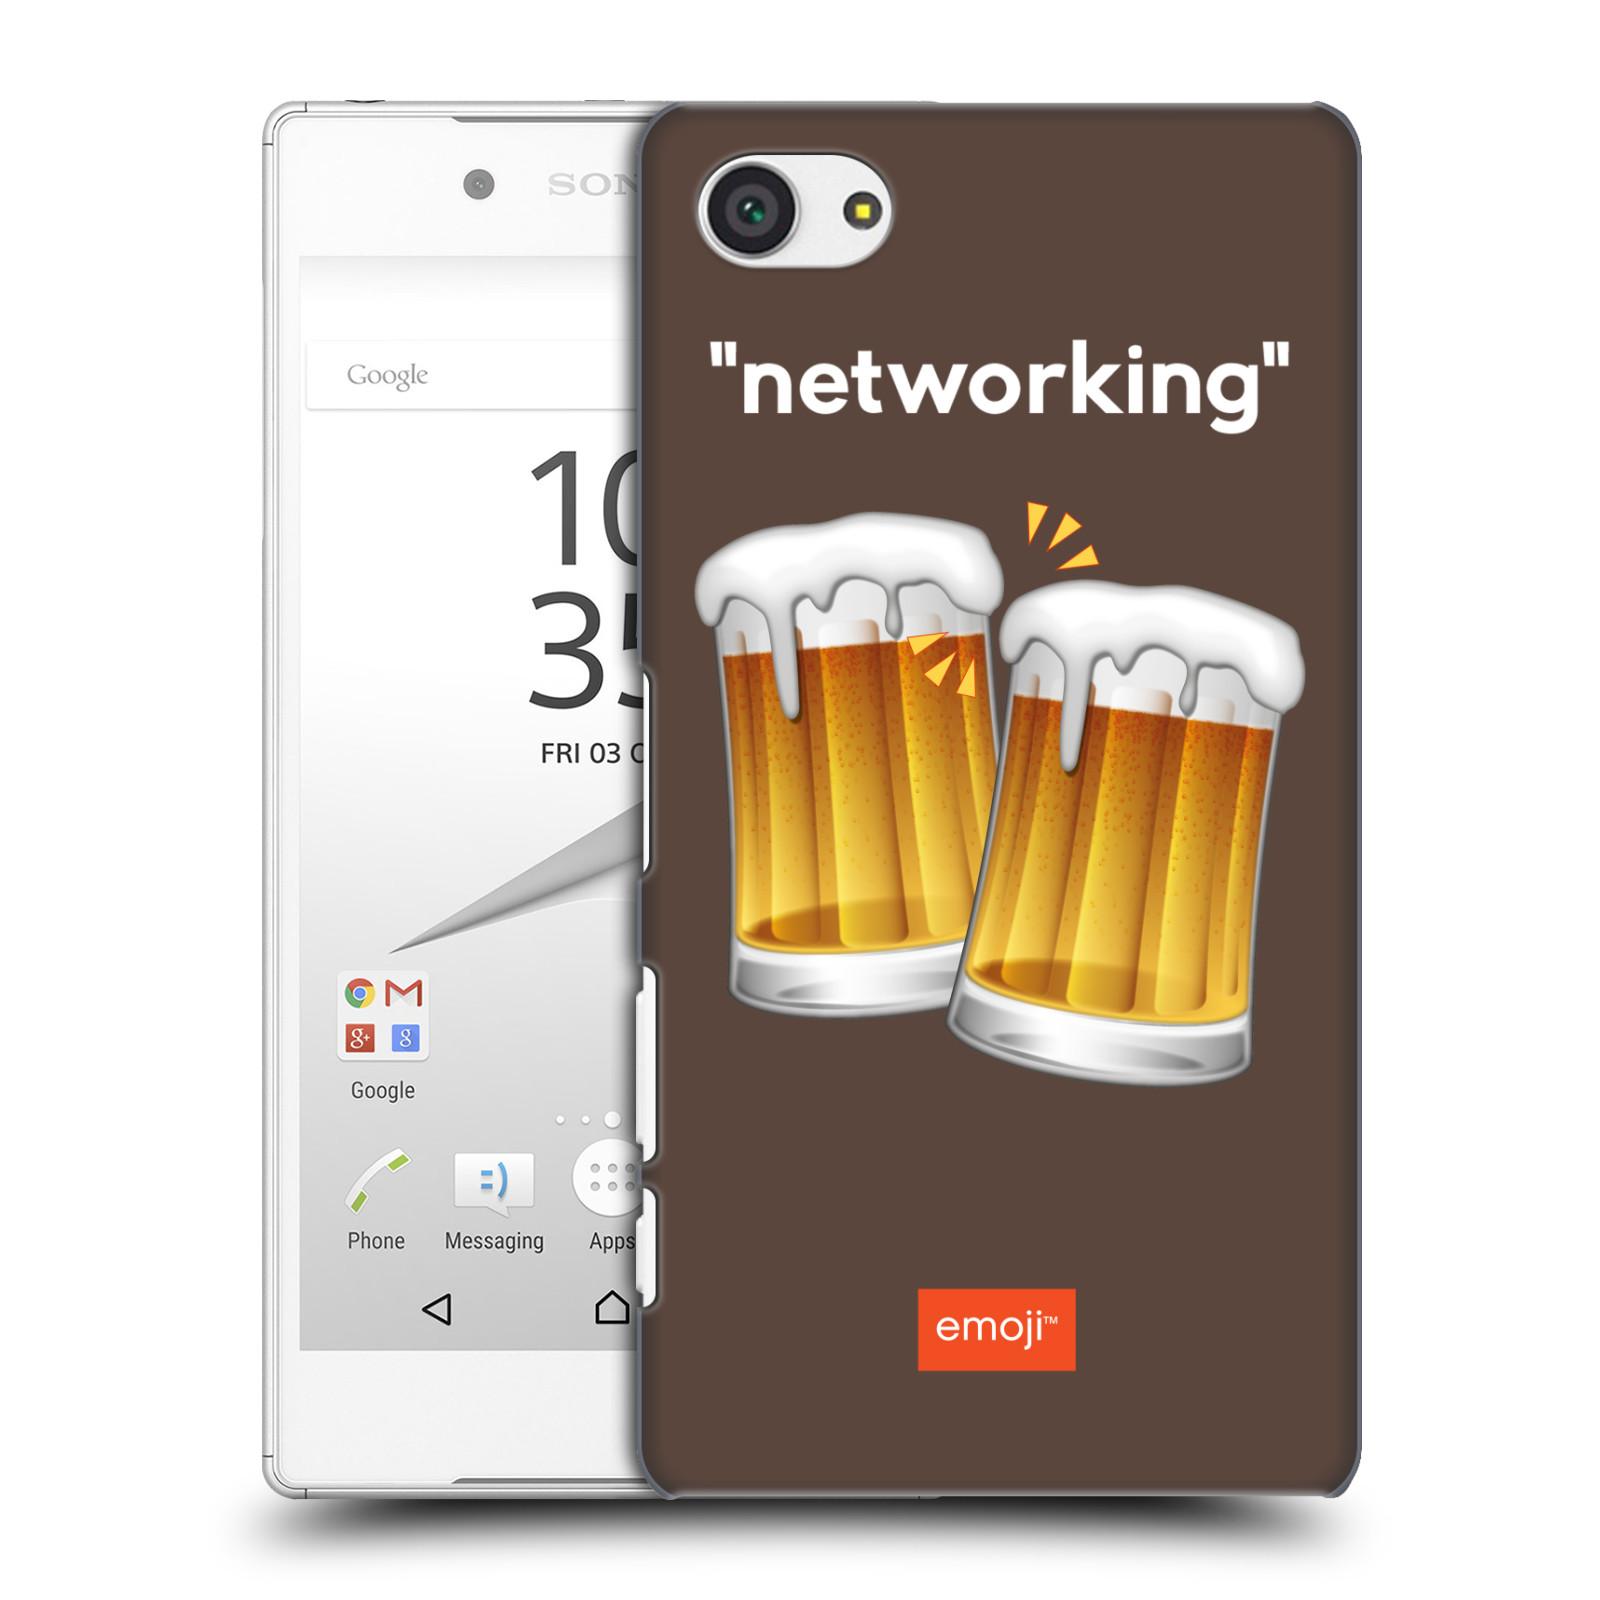 Plastové pouzdro na mobil Sony Xperia Z5 Compact HEAD CASE EMOJI - Pivní networking